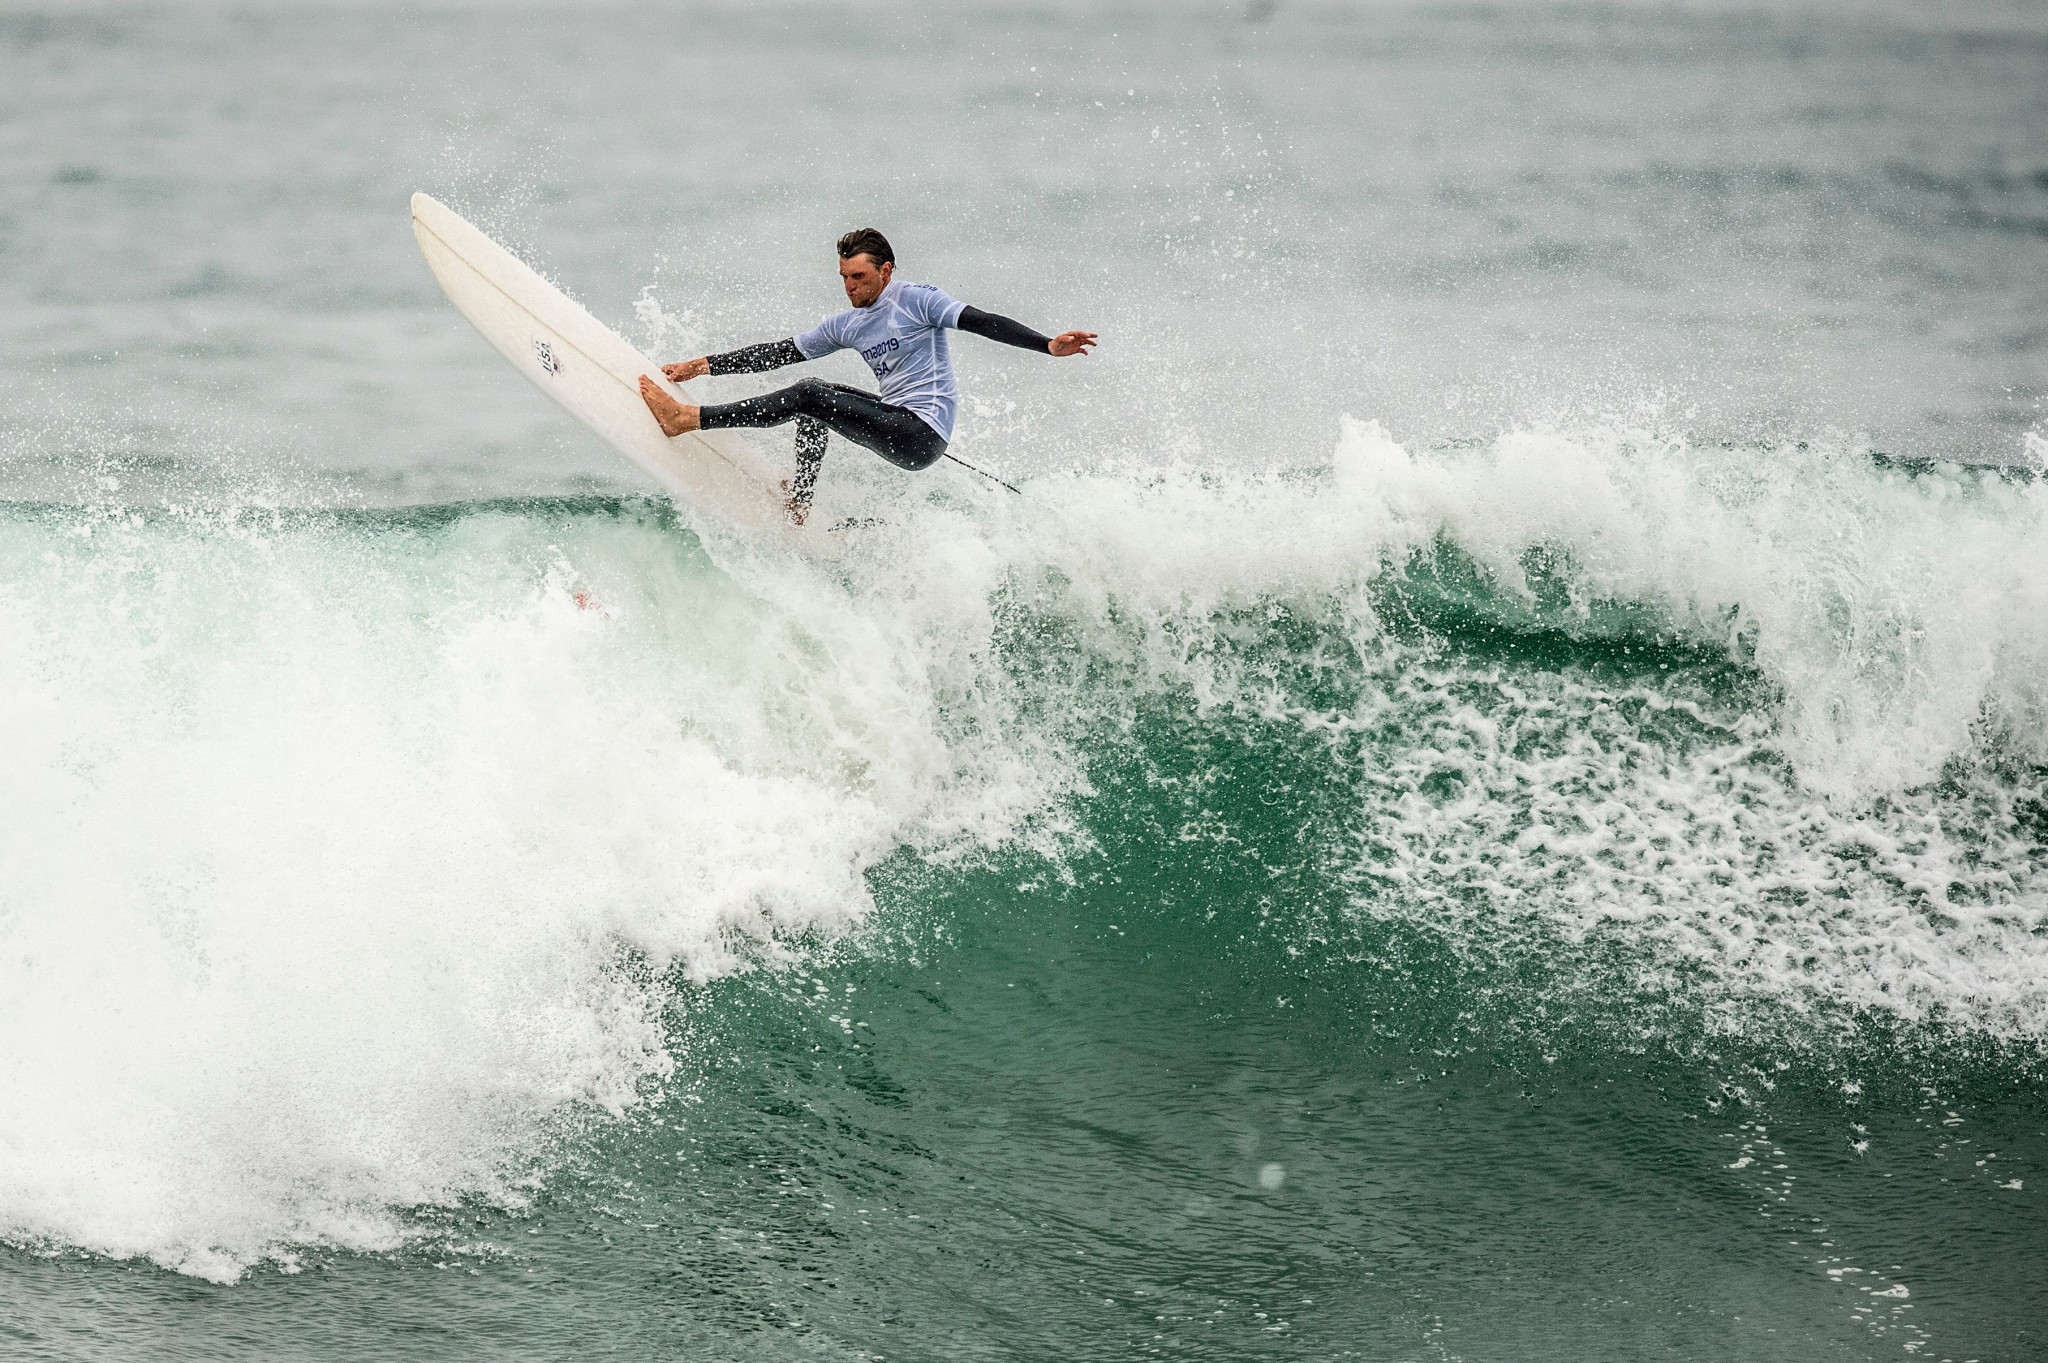 ISA World Surfing Games postponed until further notice